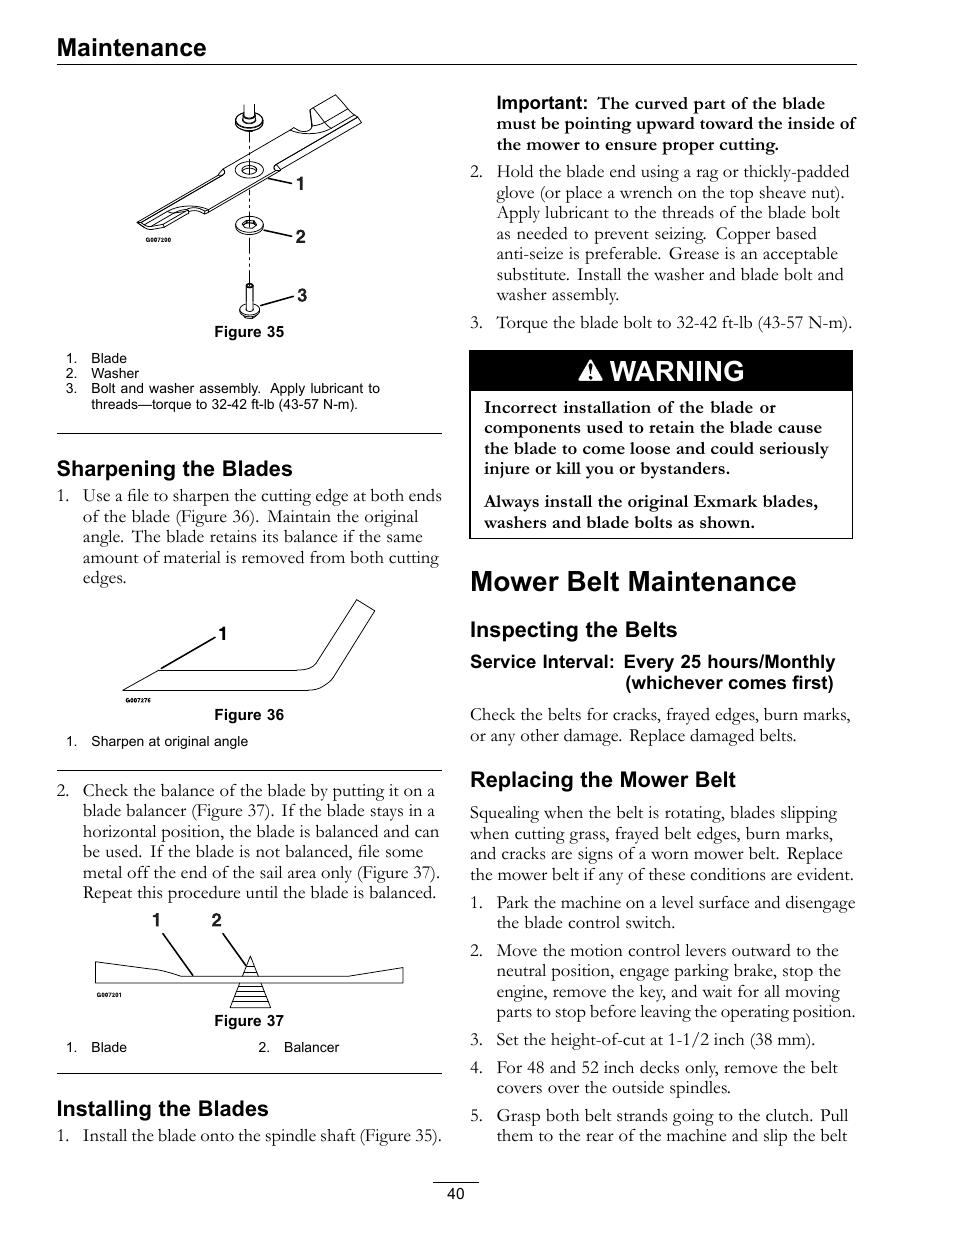 Mower belt maintenance, Figure 35, Warning   Exmark Quest 4500-450